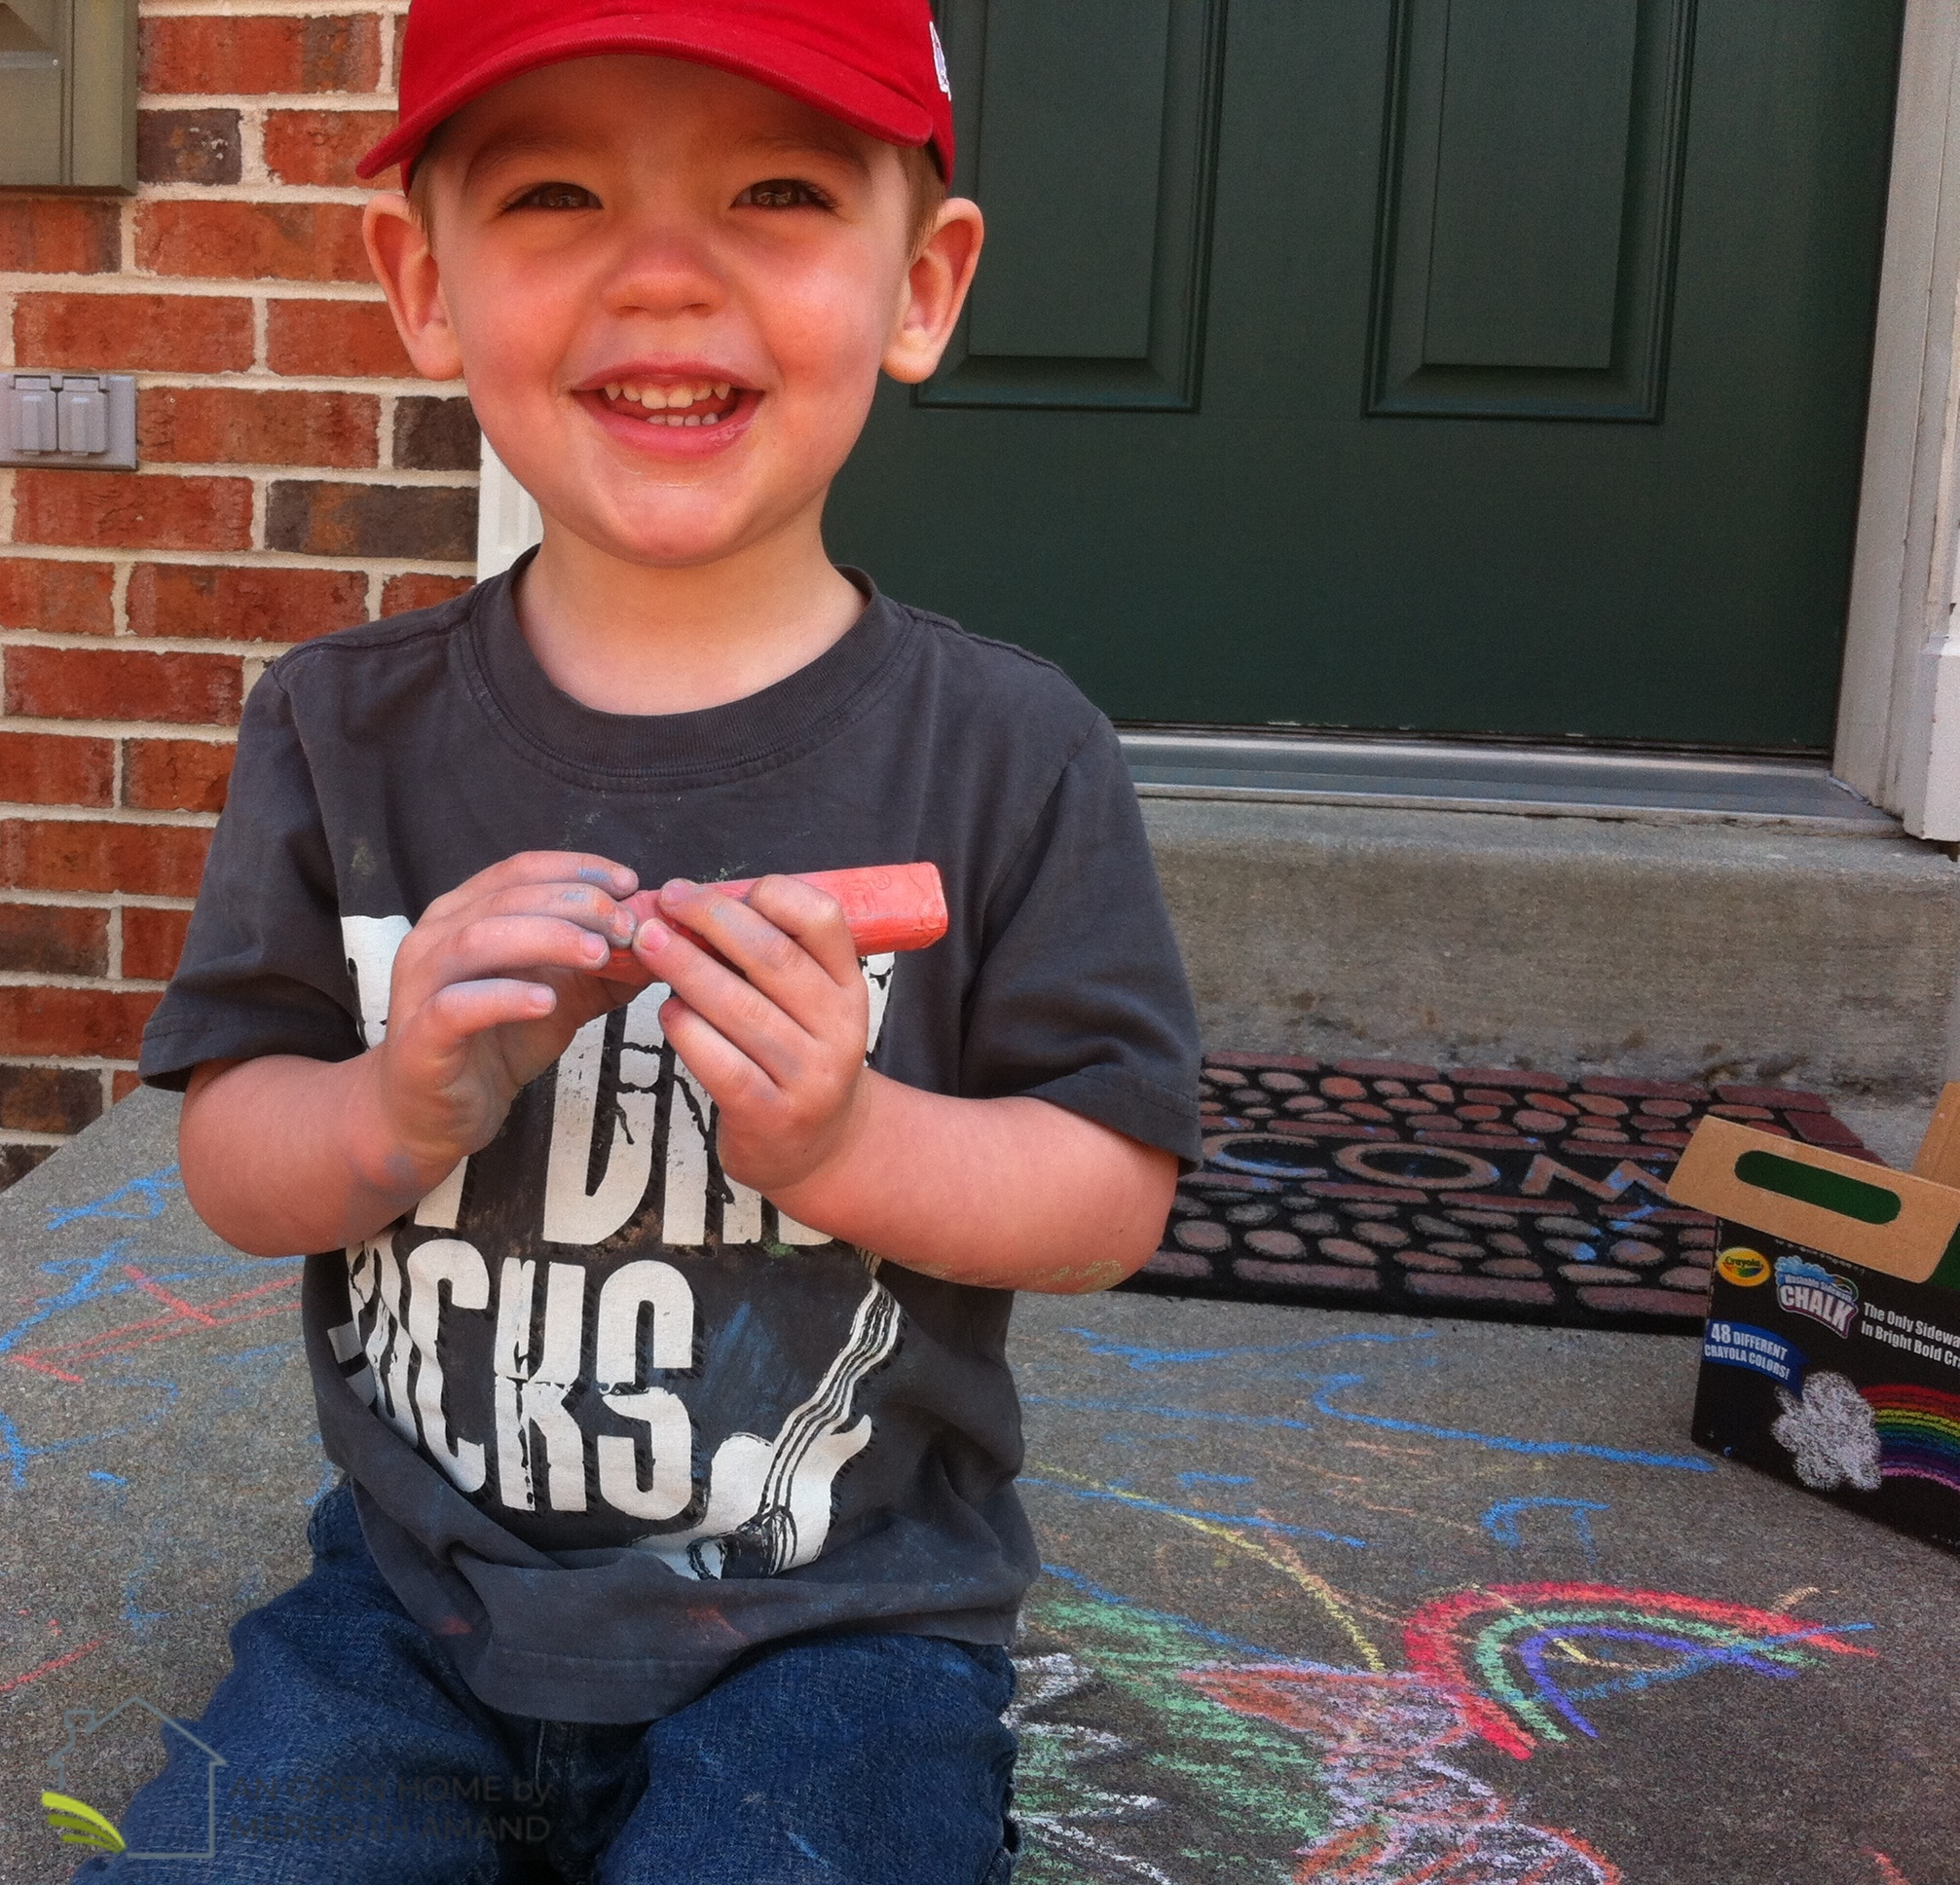 15 Sidewalk Chalk Activities for Kids